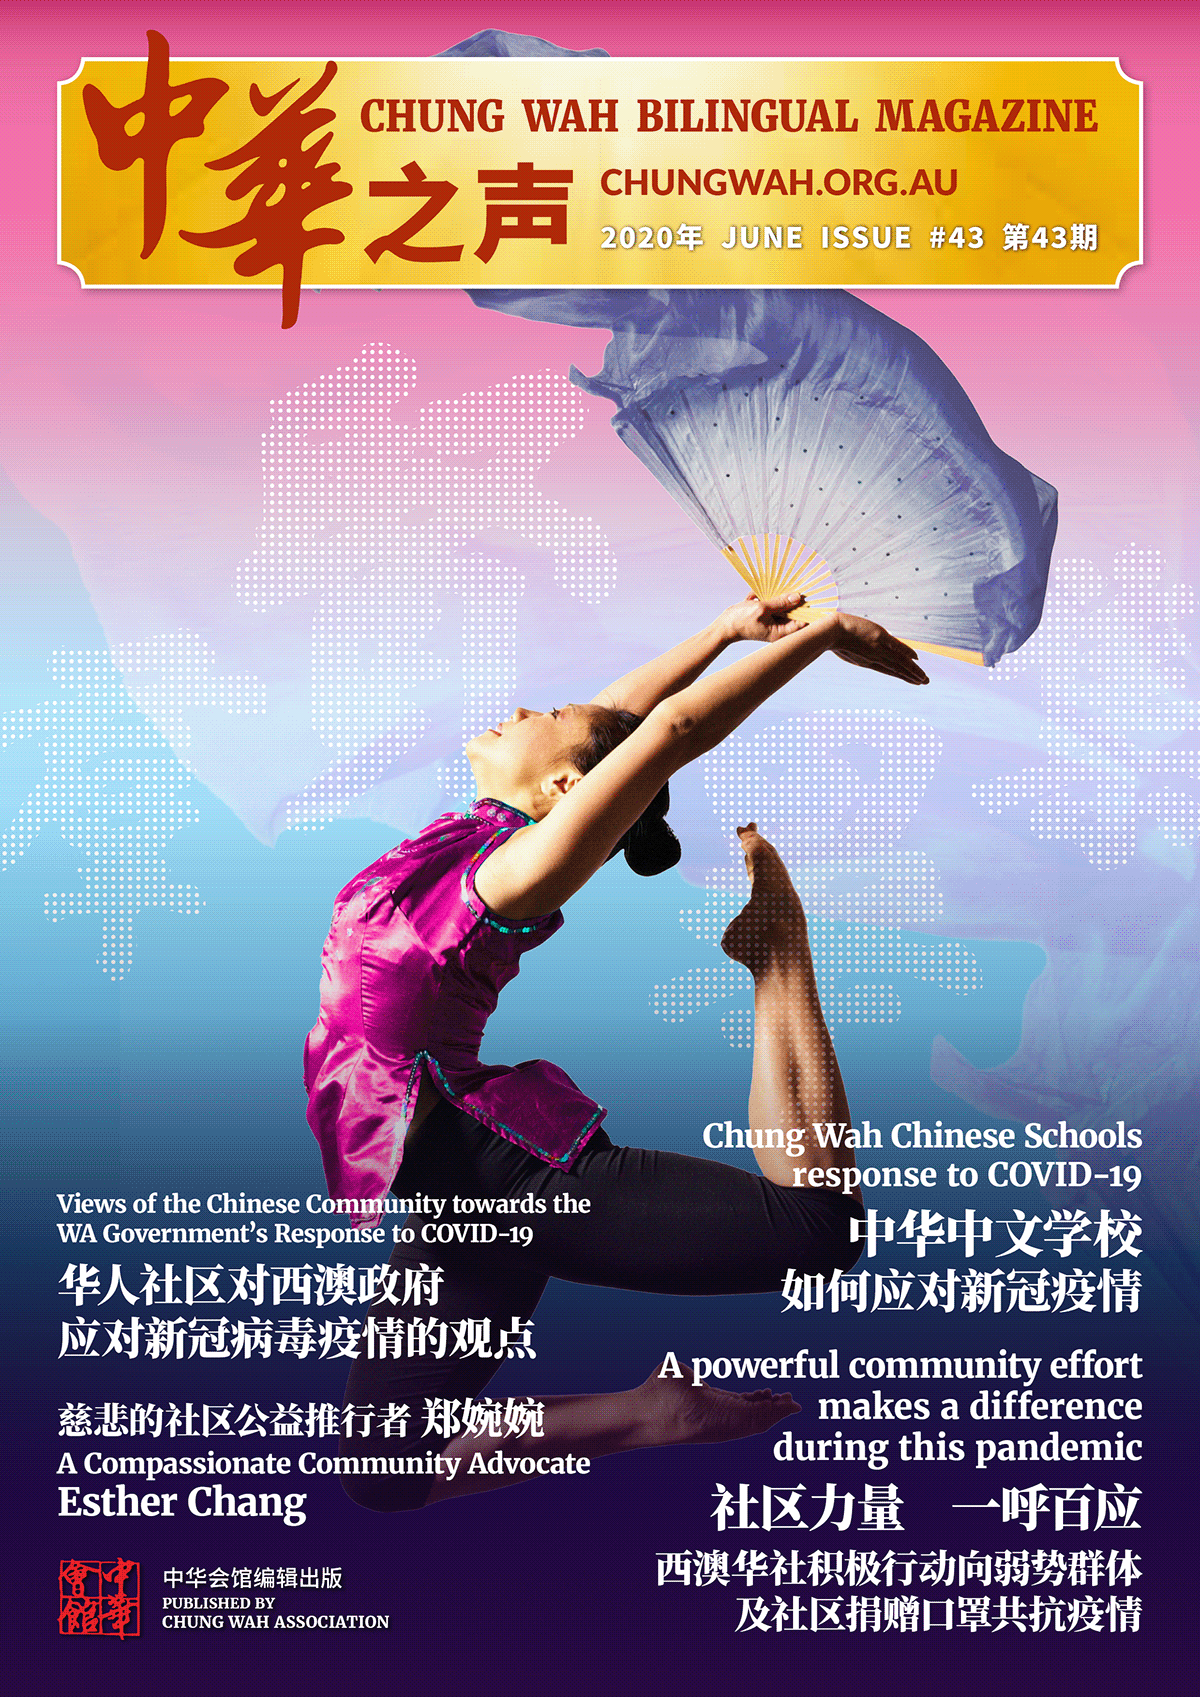 Chung Wah Magazine Issue 43, 2020